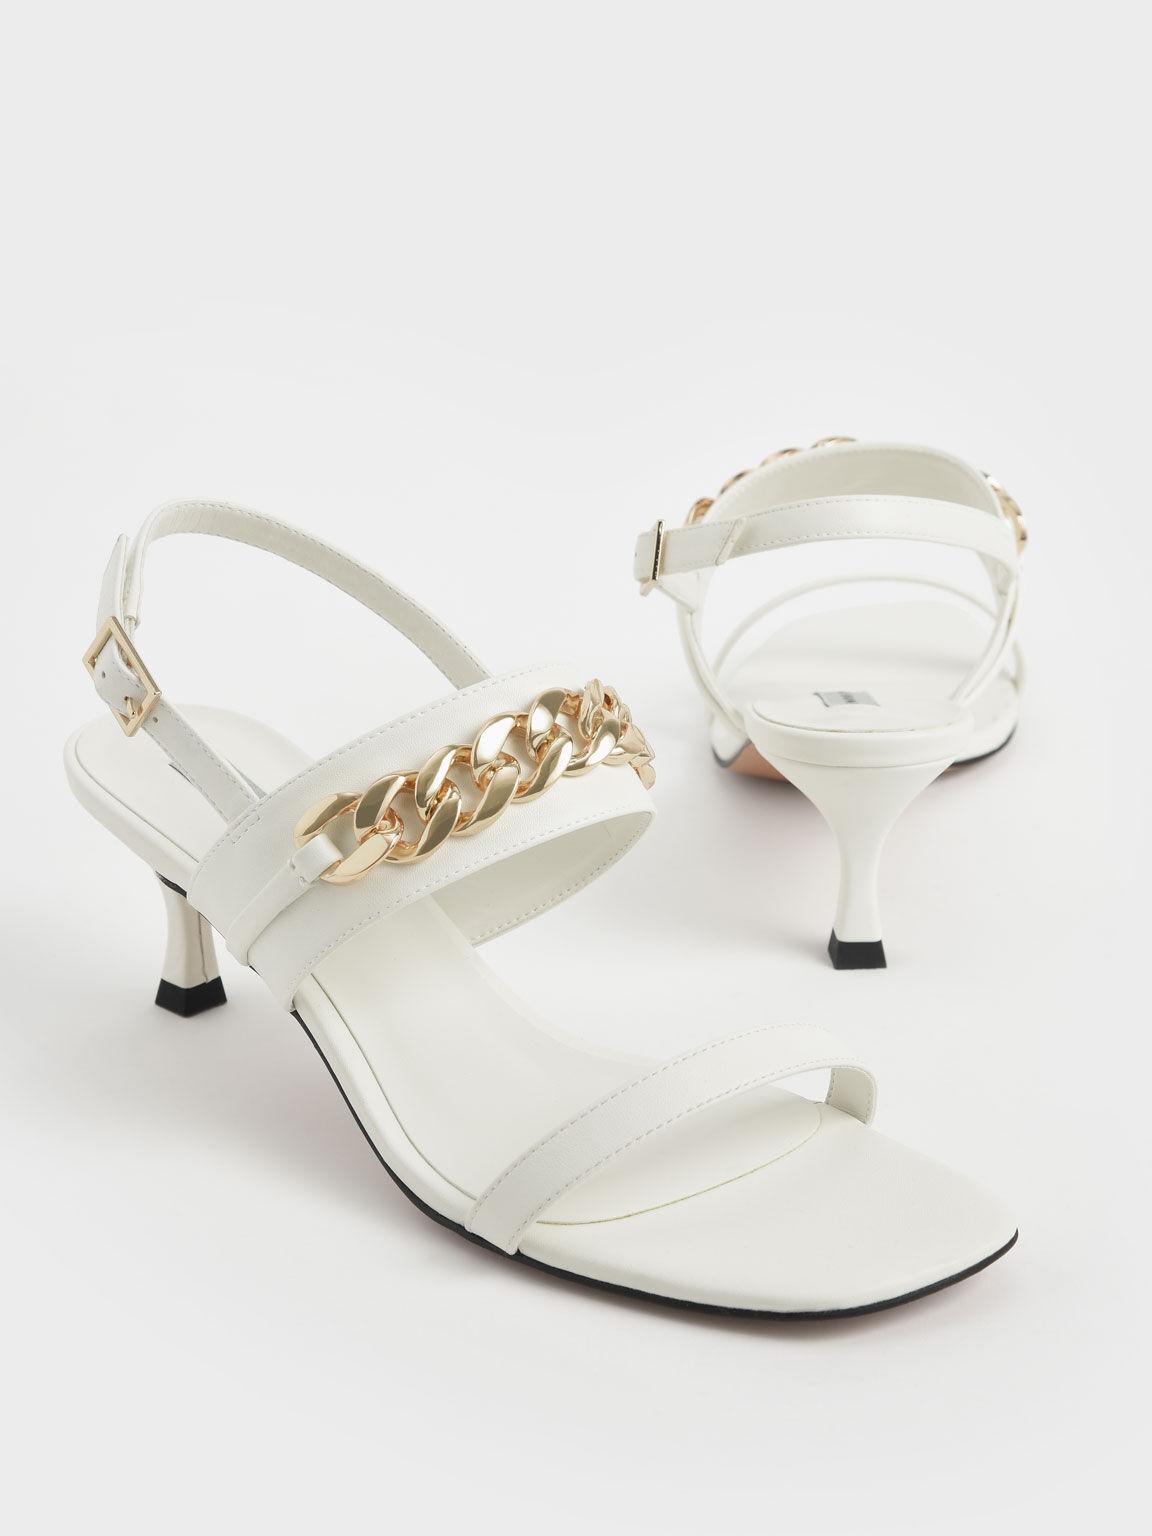 Chain Strap Heeled Sandals, White, hi-res